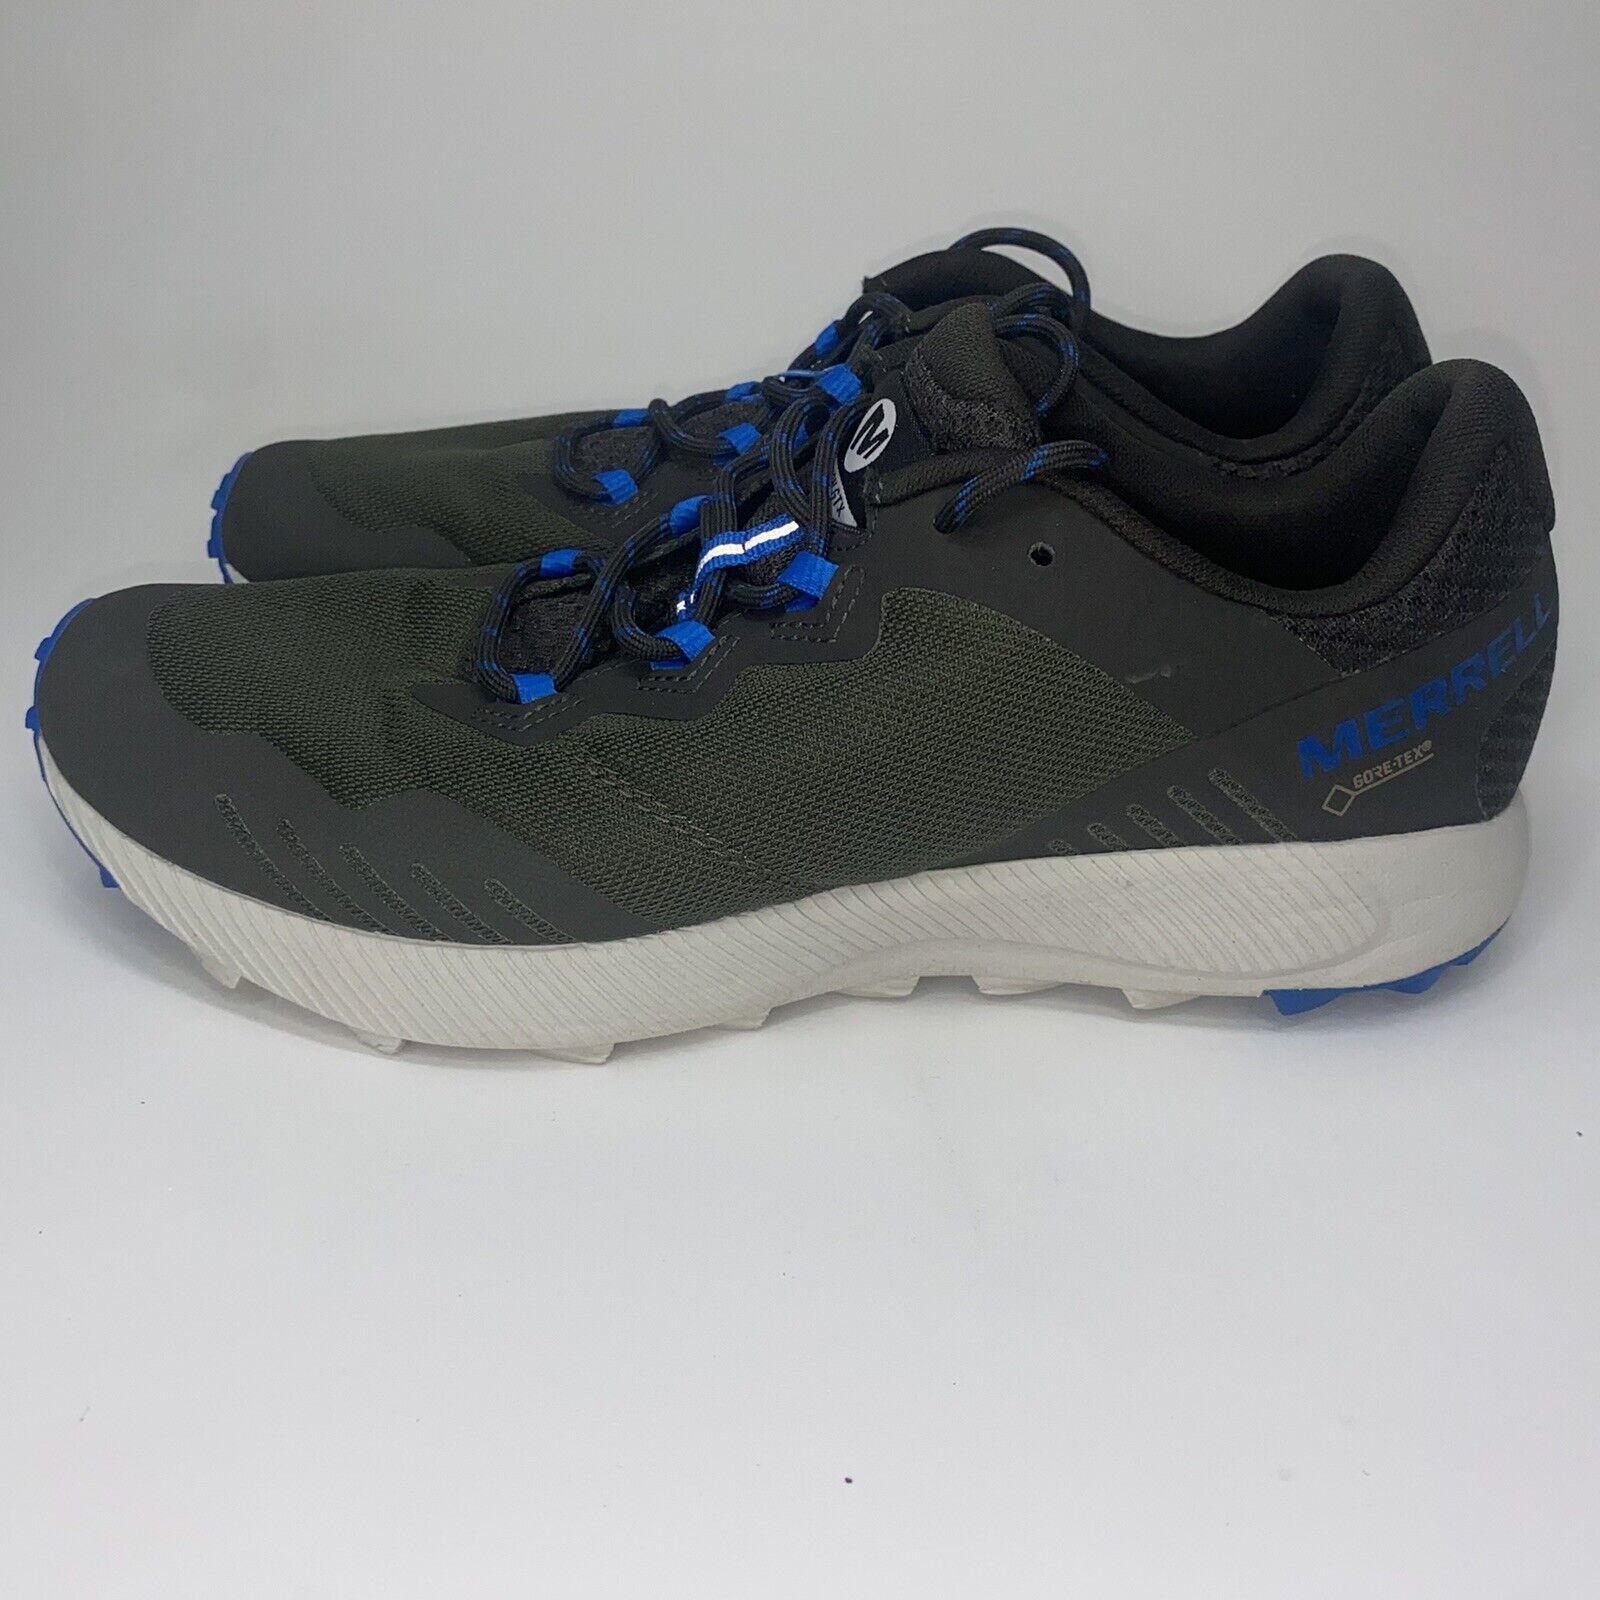 Merrell Fluxion GTX Gore-tex Waterproof J99589 Men Hiking Shoes Sz 8